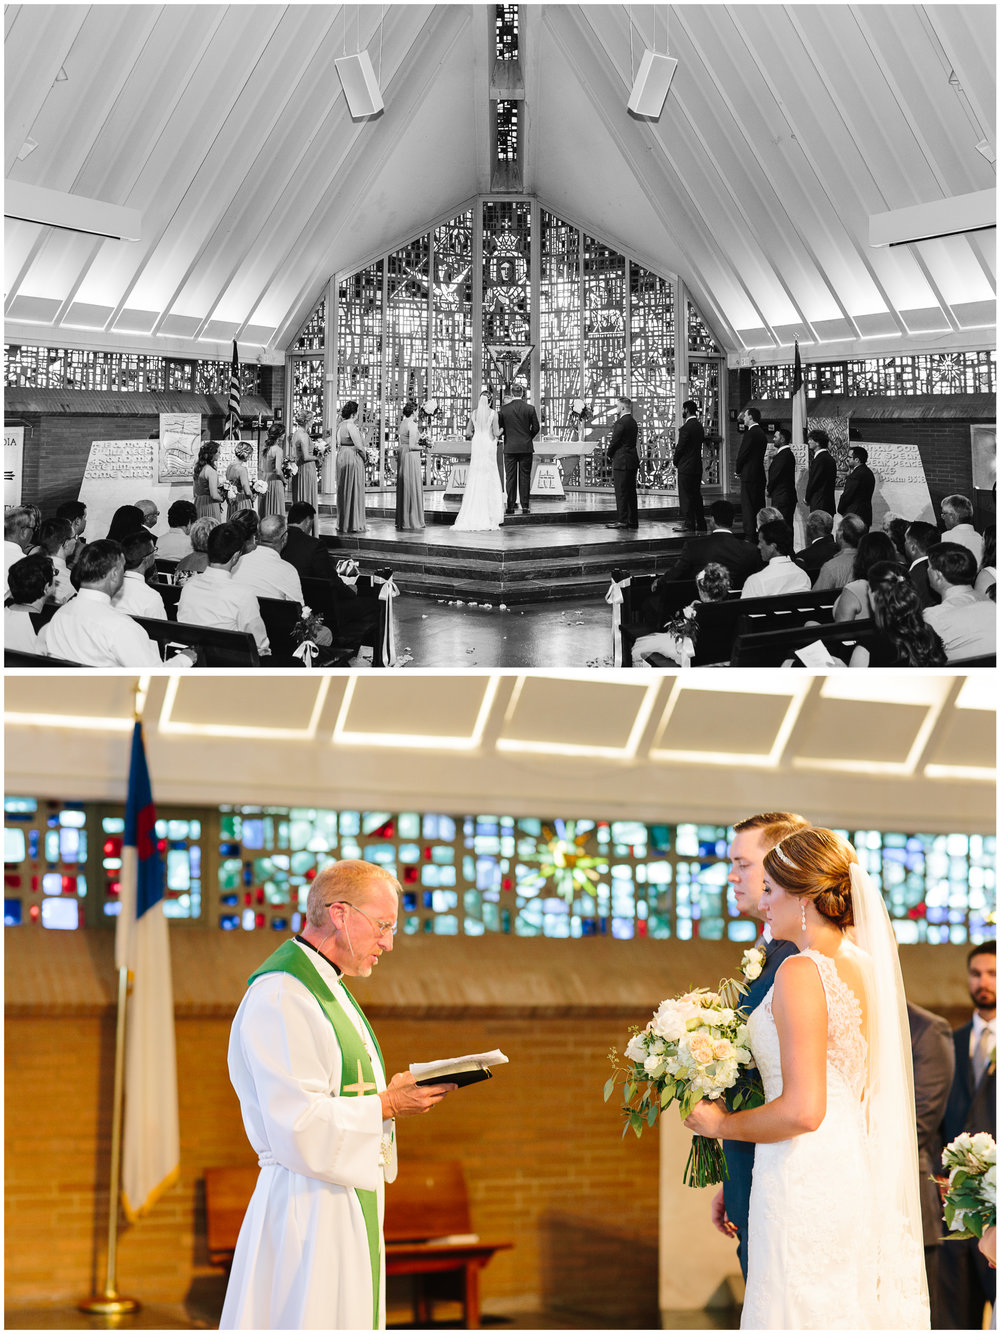 ann_arbor_michigan_wedding_64.jpg